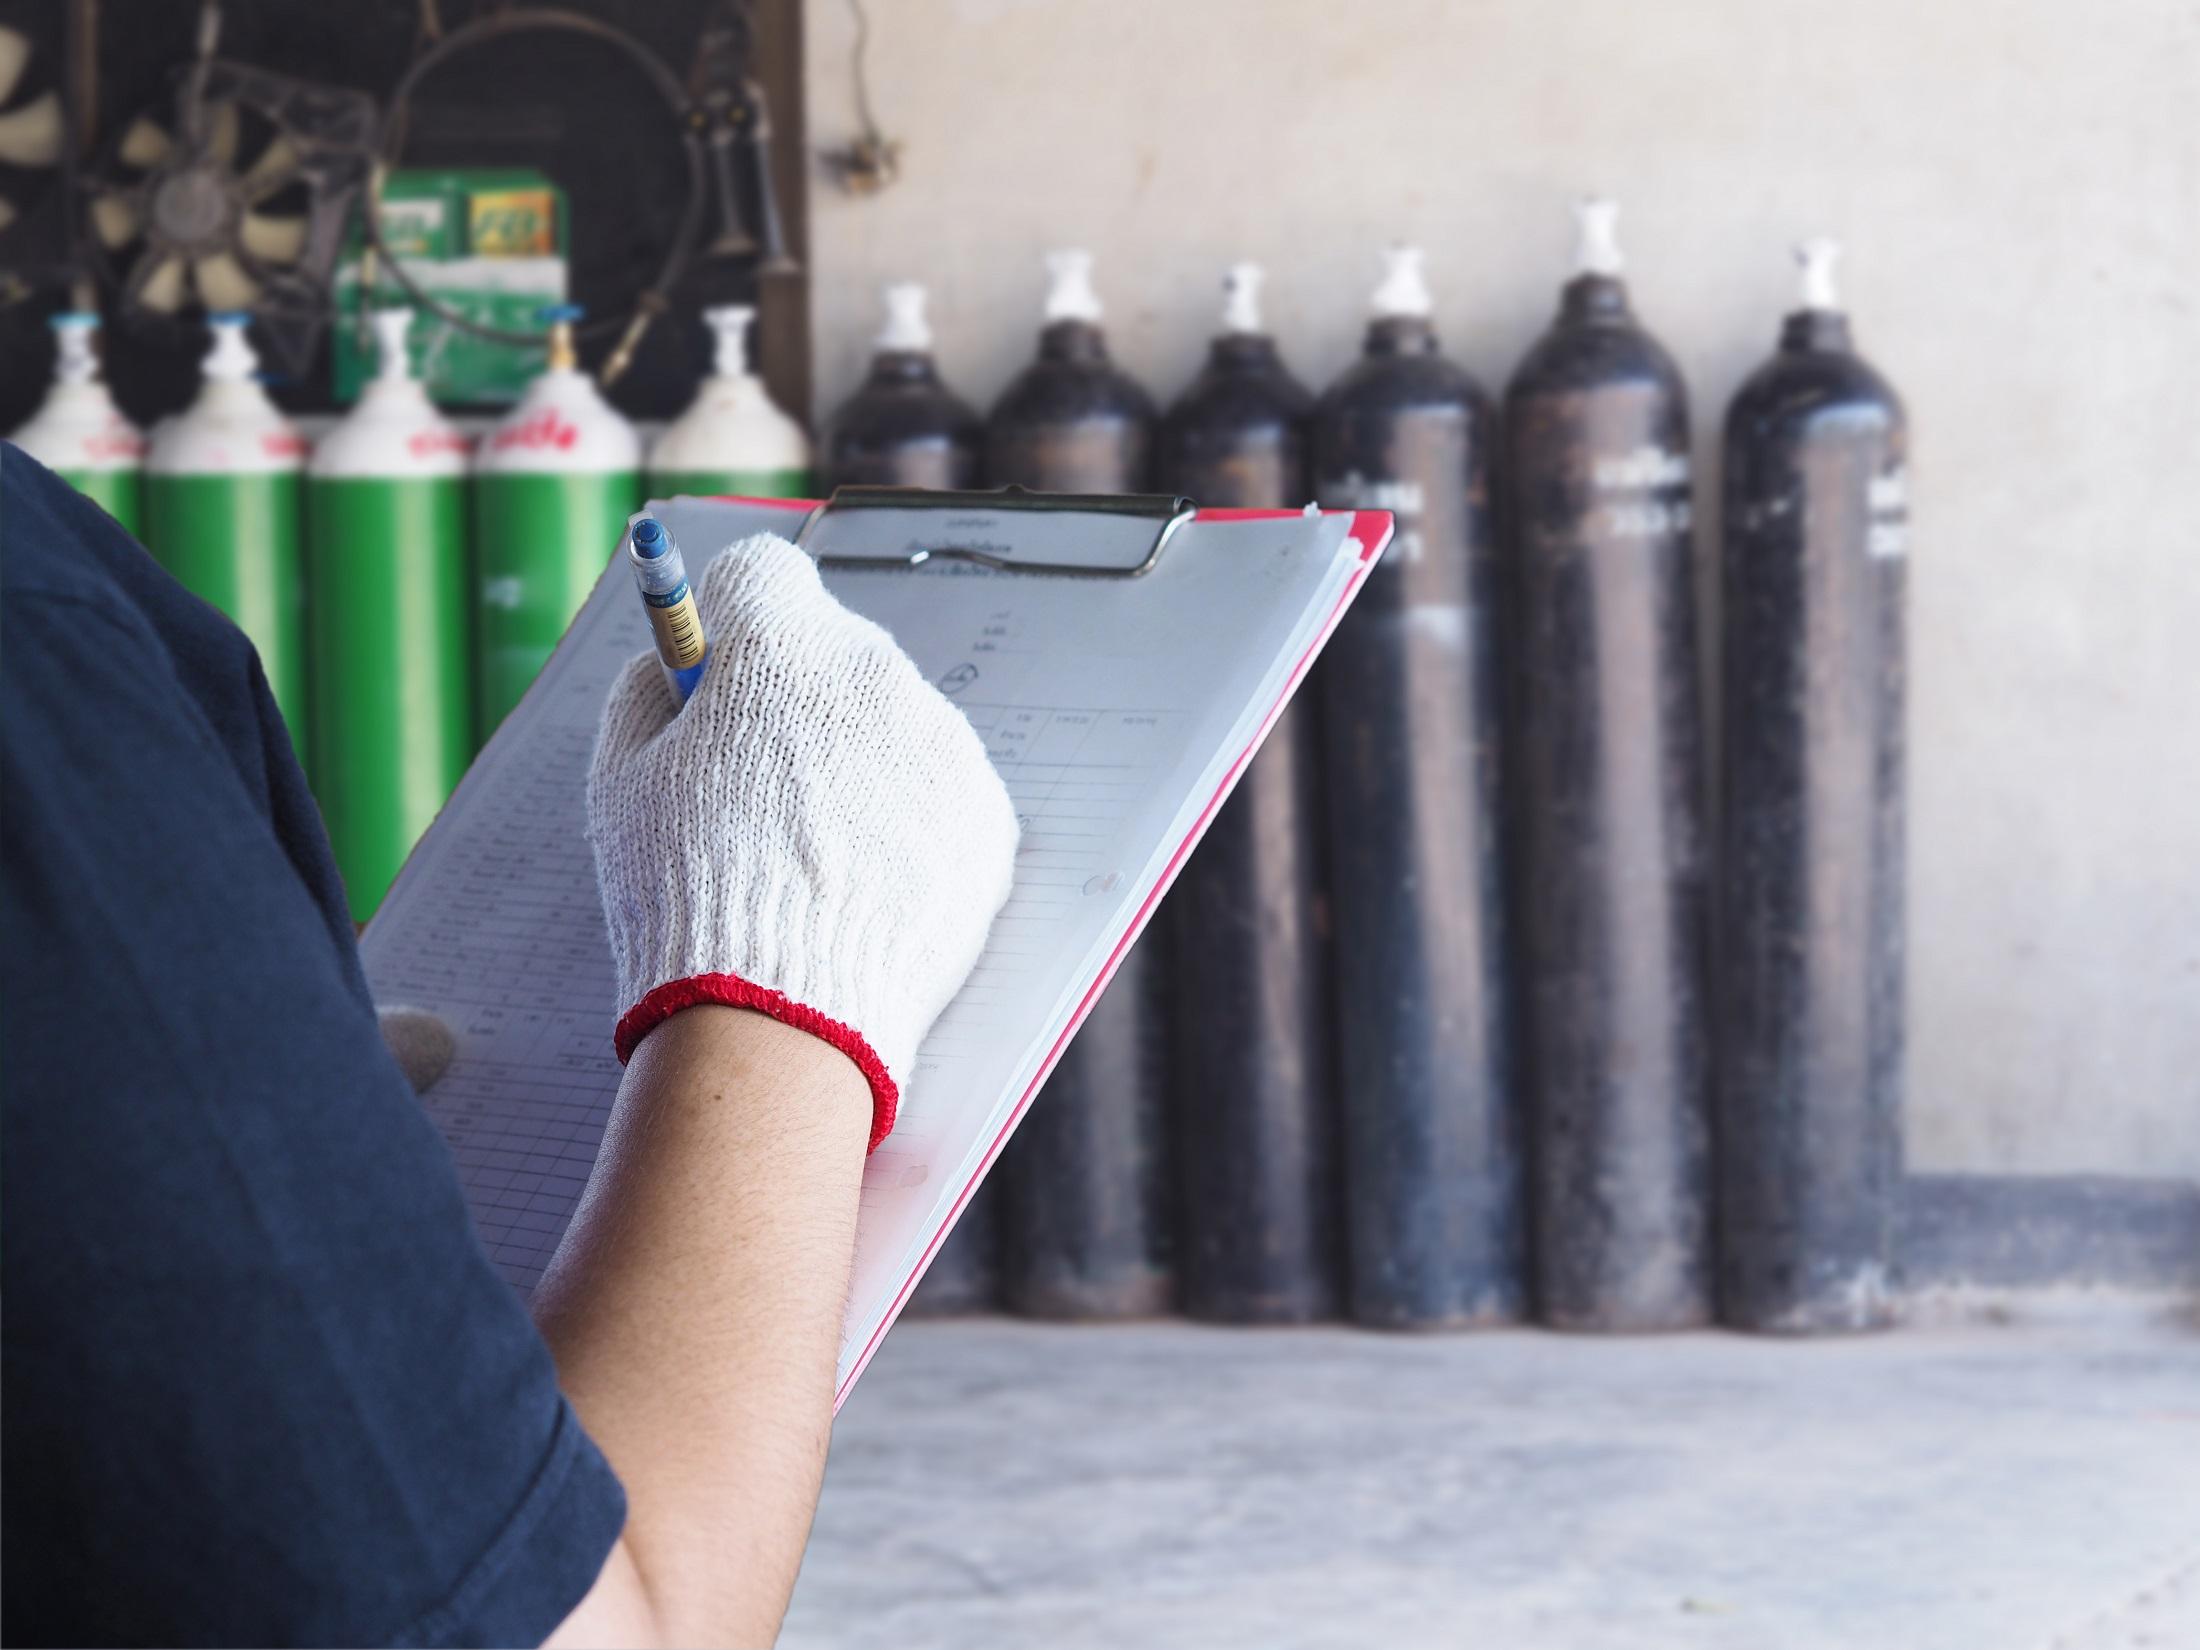 LPG Gas Bottle Location Regulations